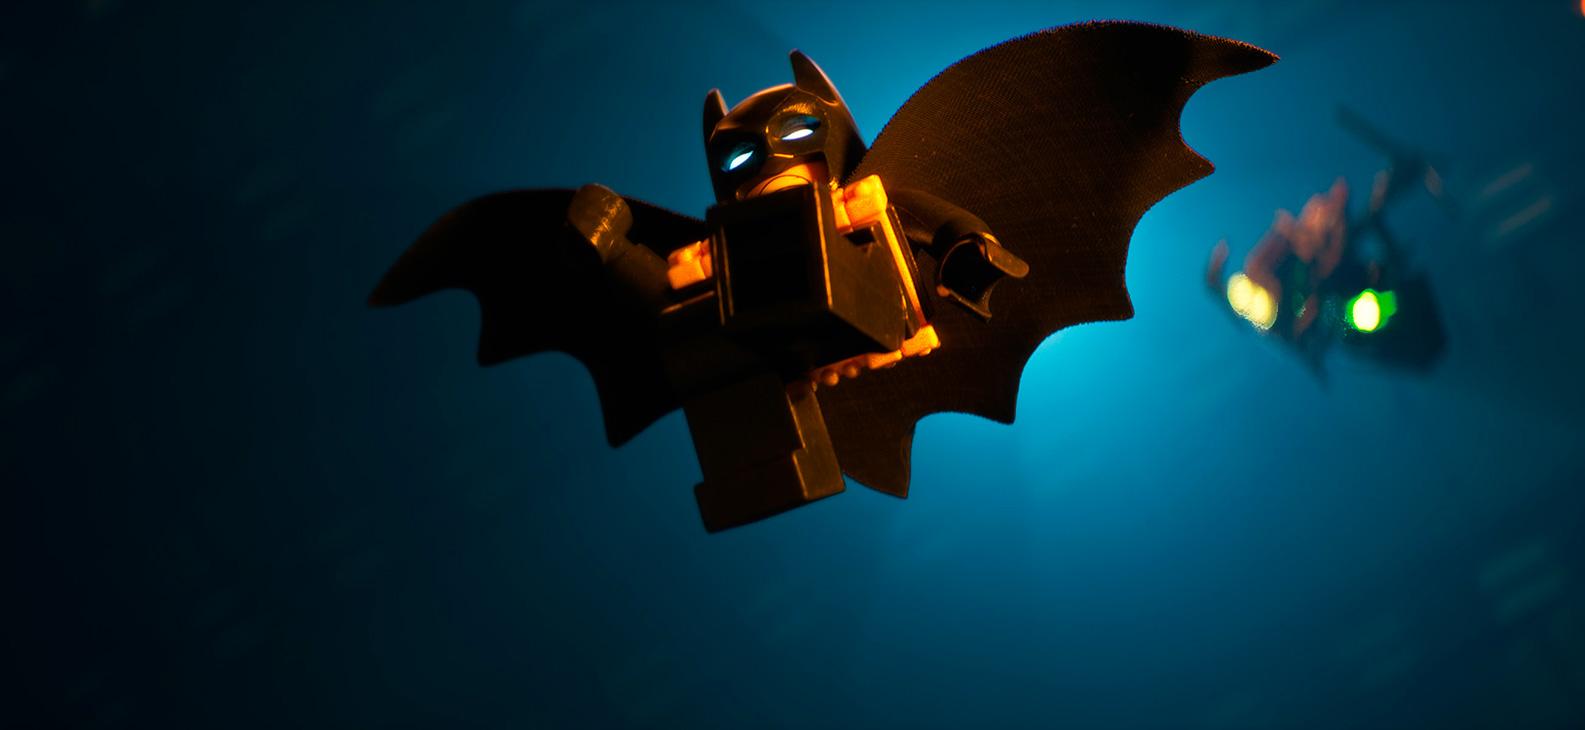 02 LEGO Batman